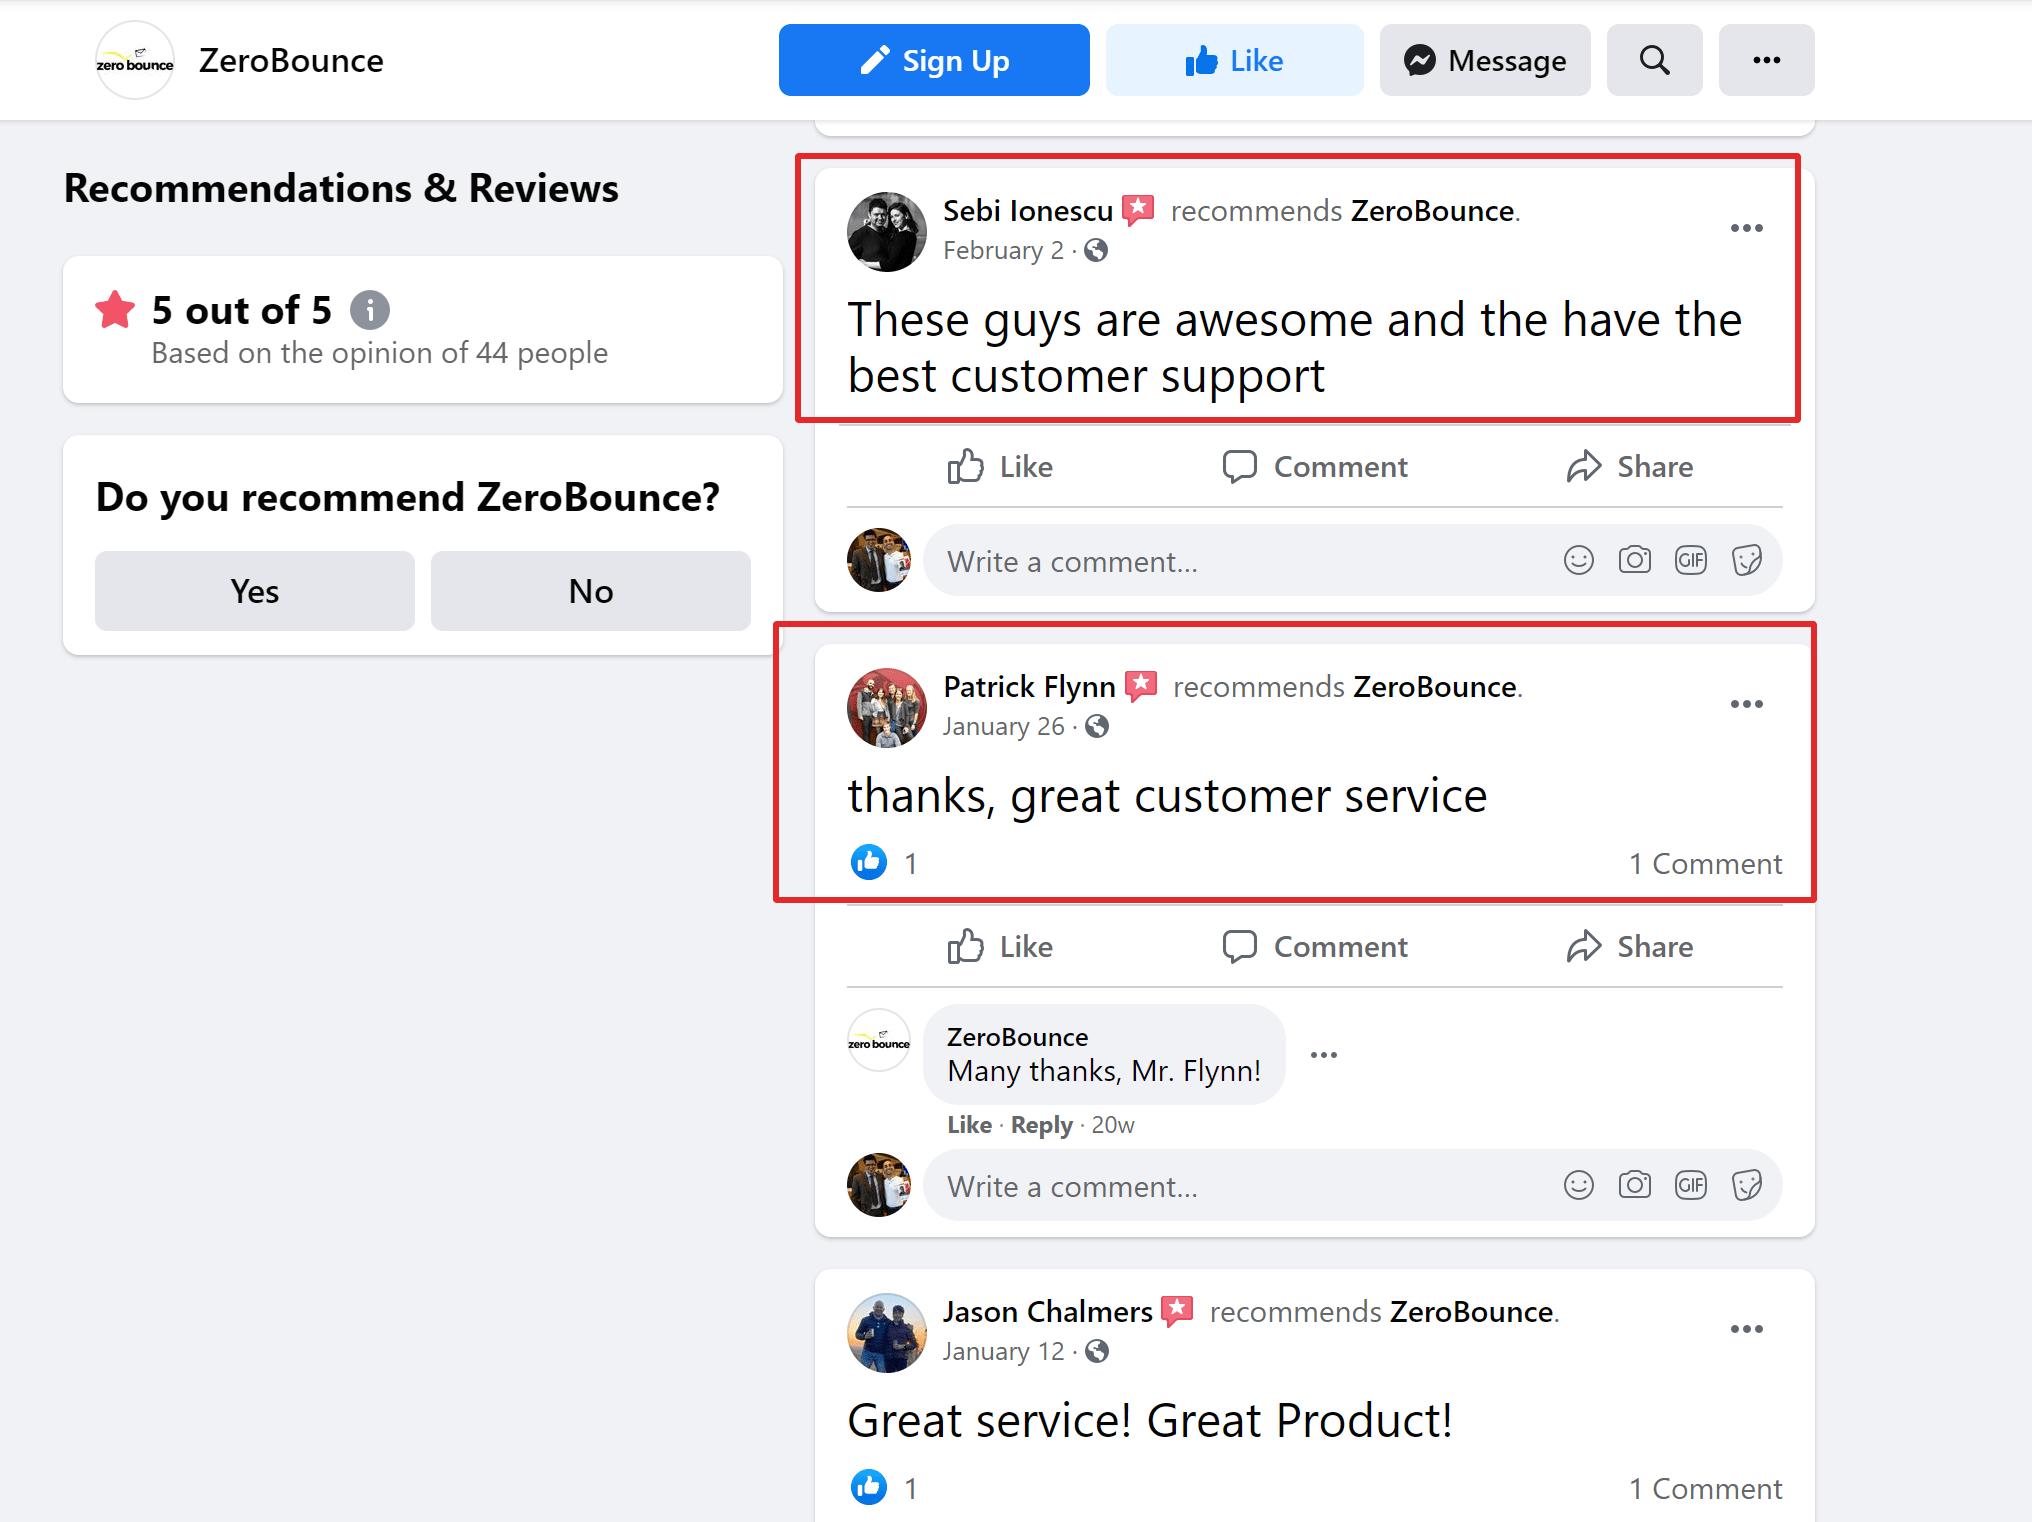 ZeroBounce Customer Reviews & Testimonials